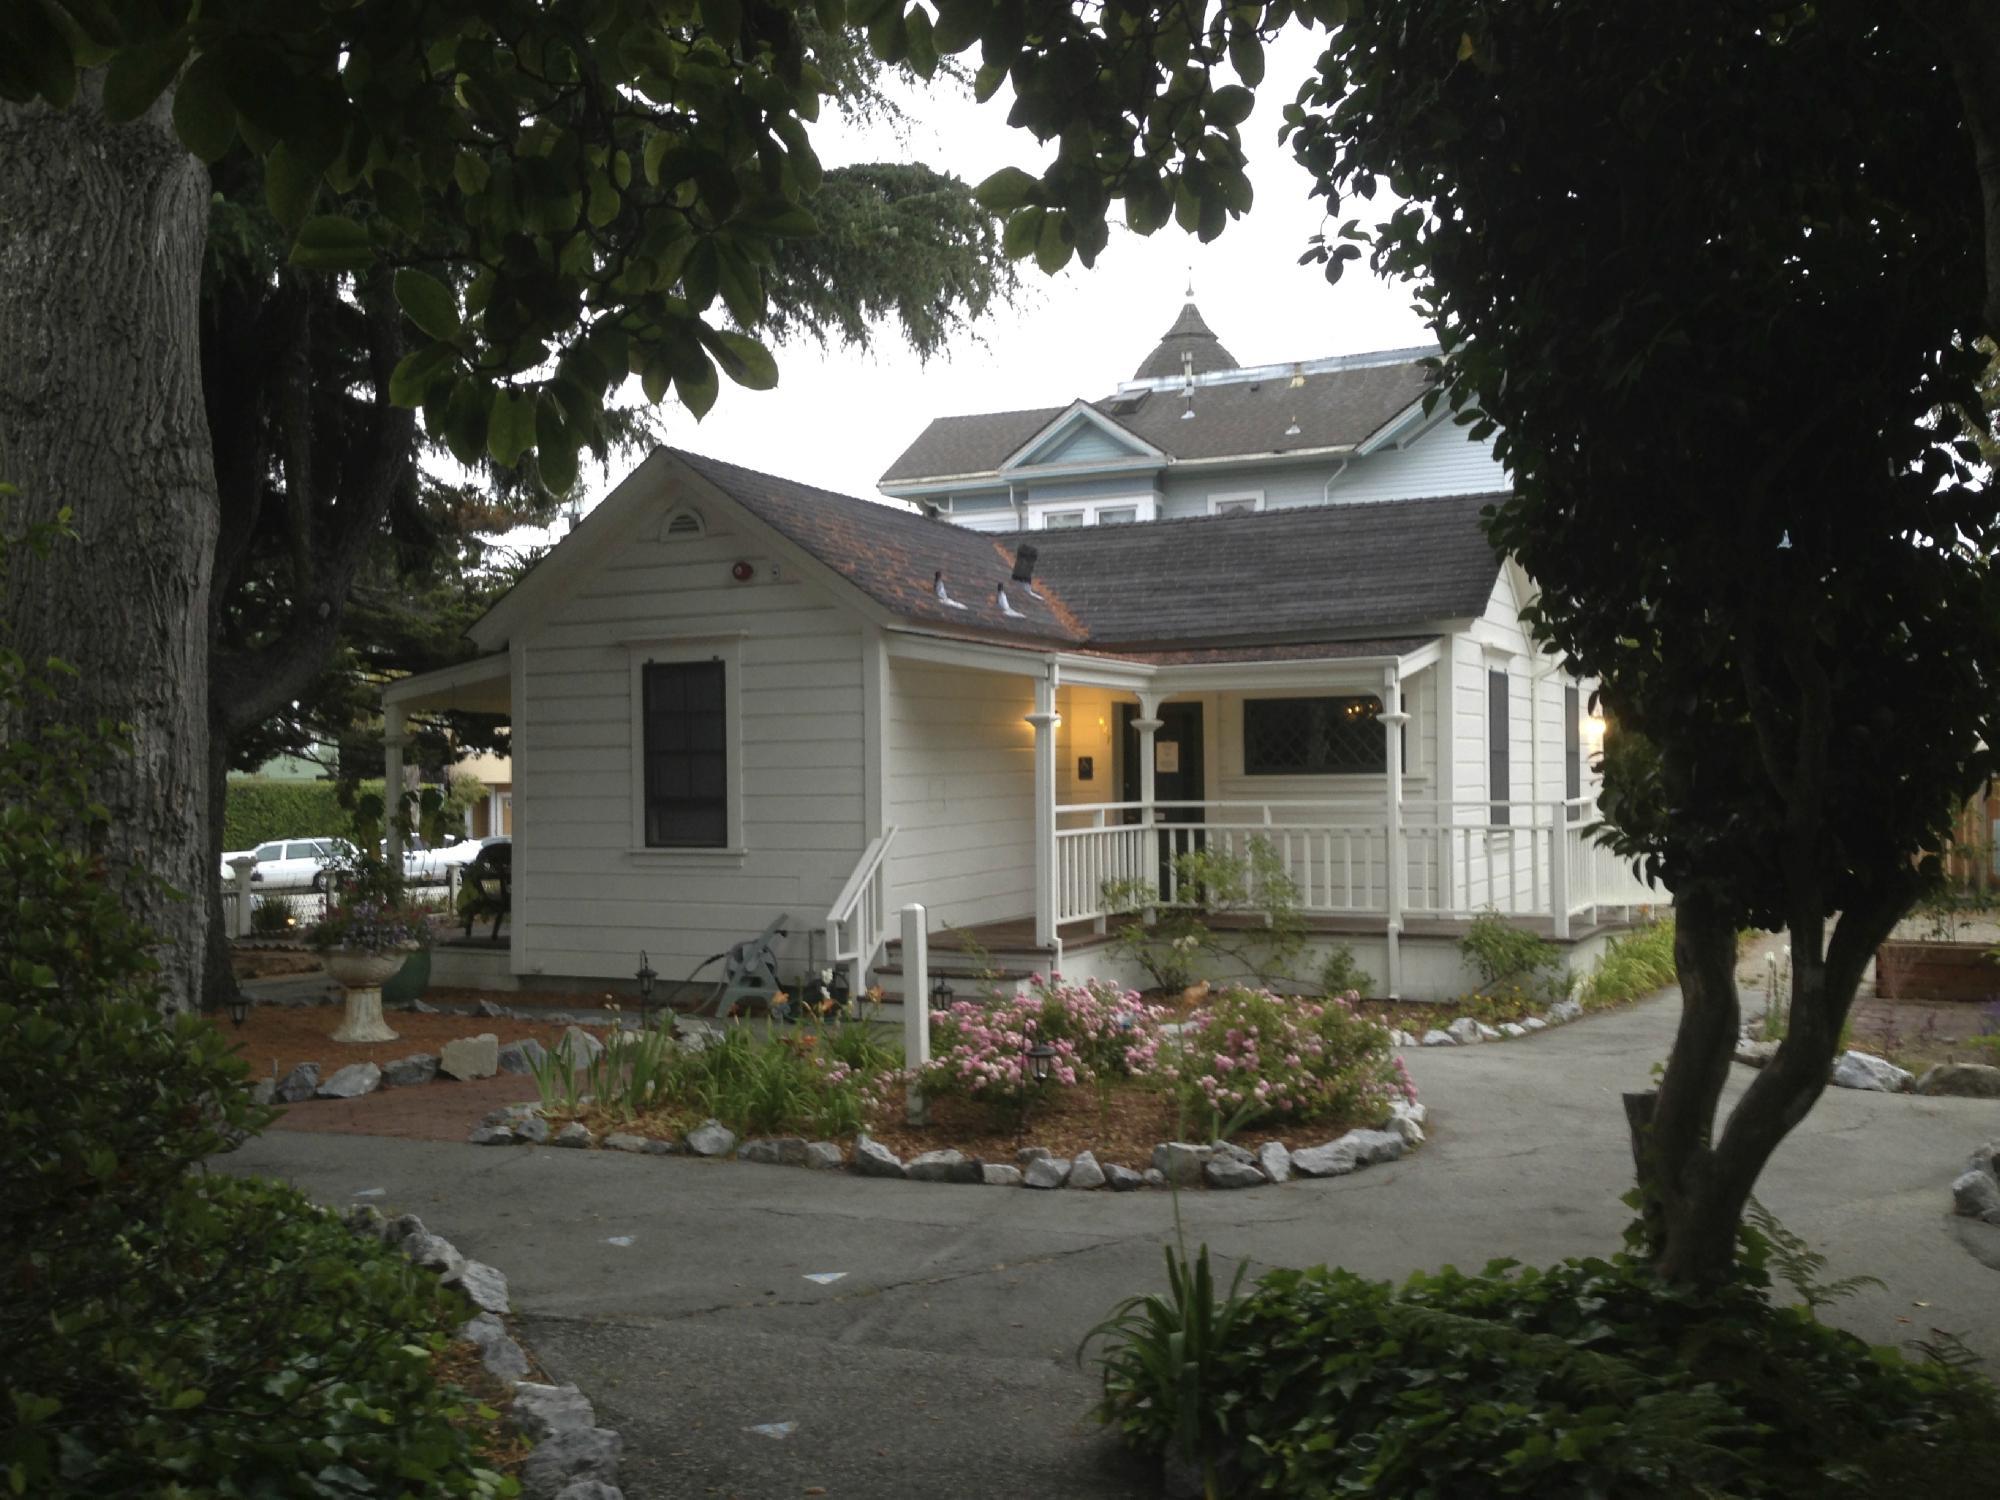 Santa Cruz Youth Hostel Carmelita Cottages